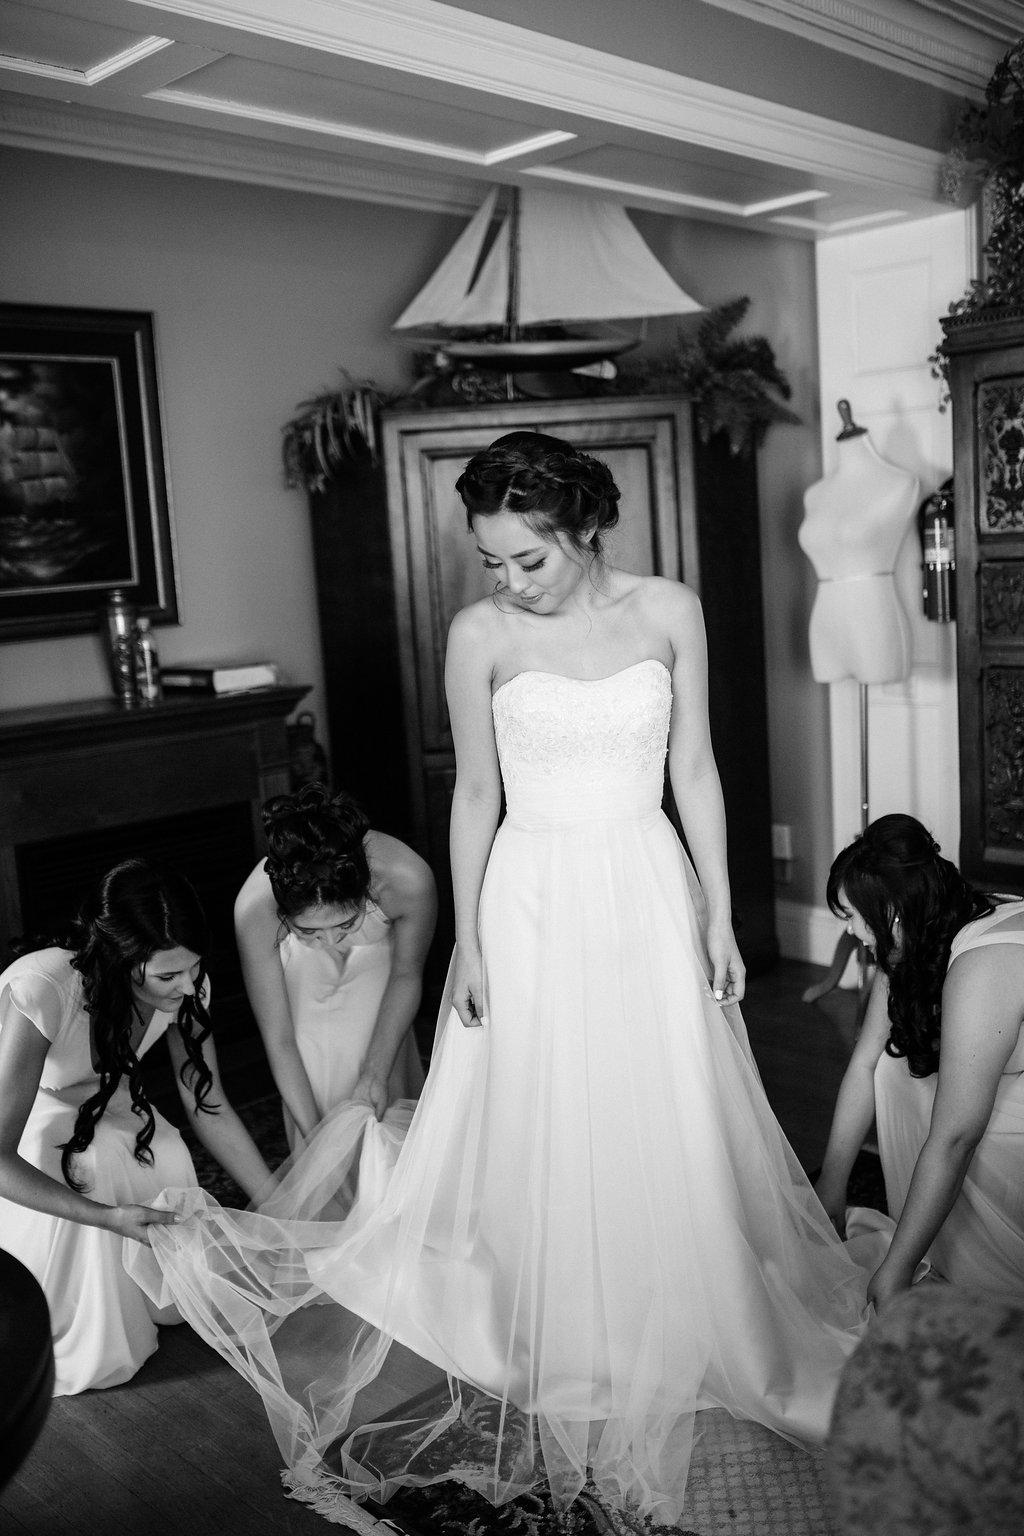 Kellylemonphotography_lucy+kento_weddingpreviews-2.jpg